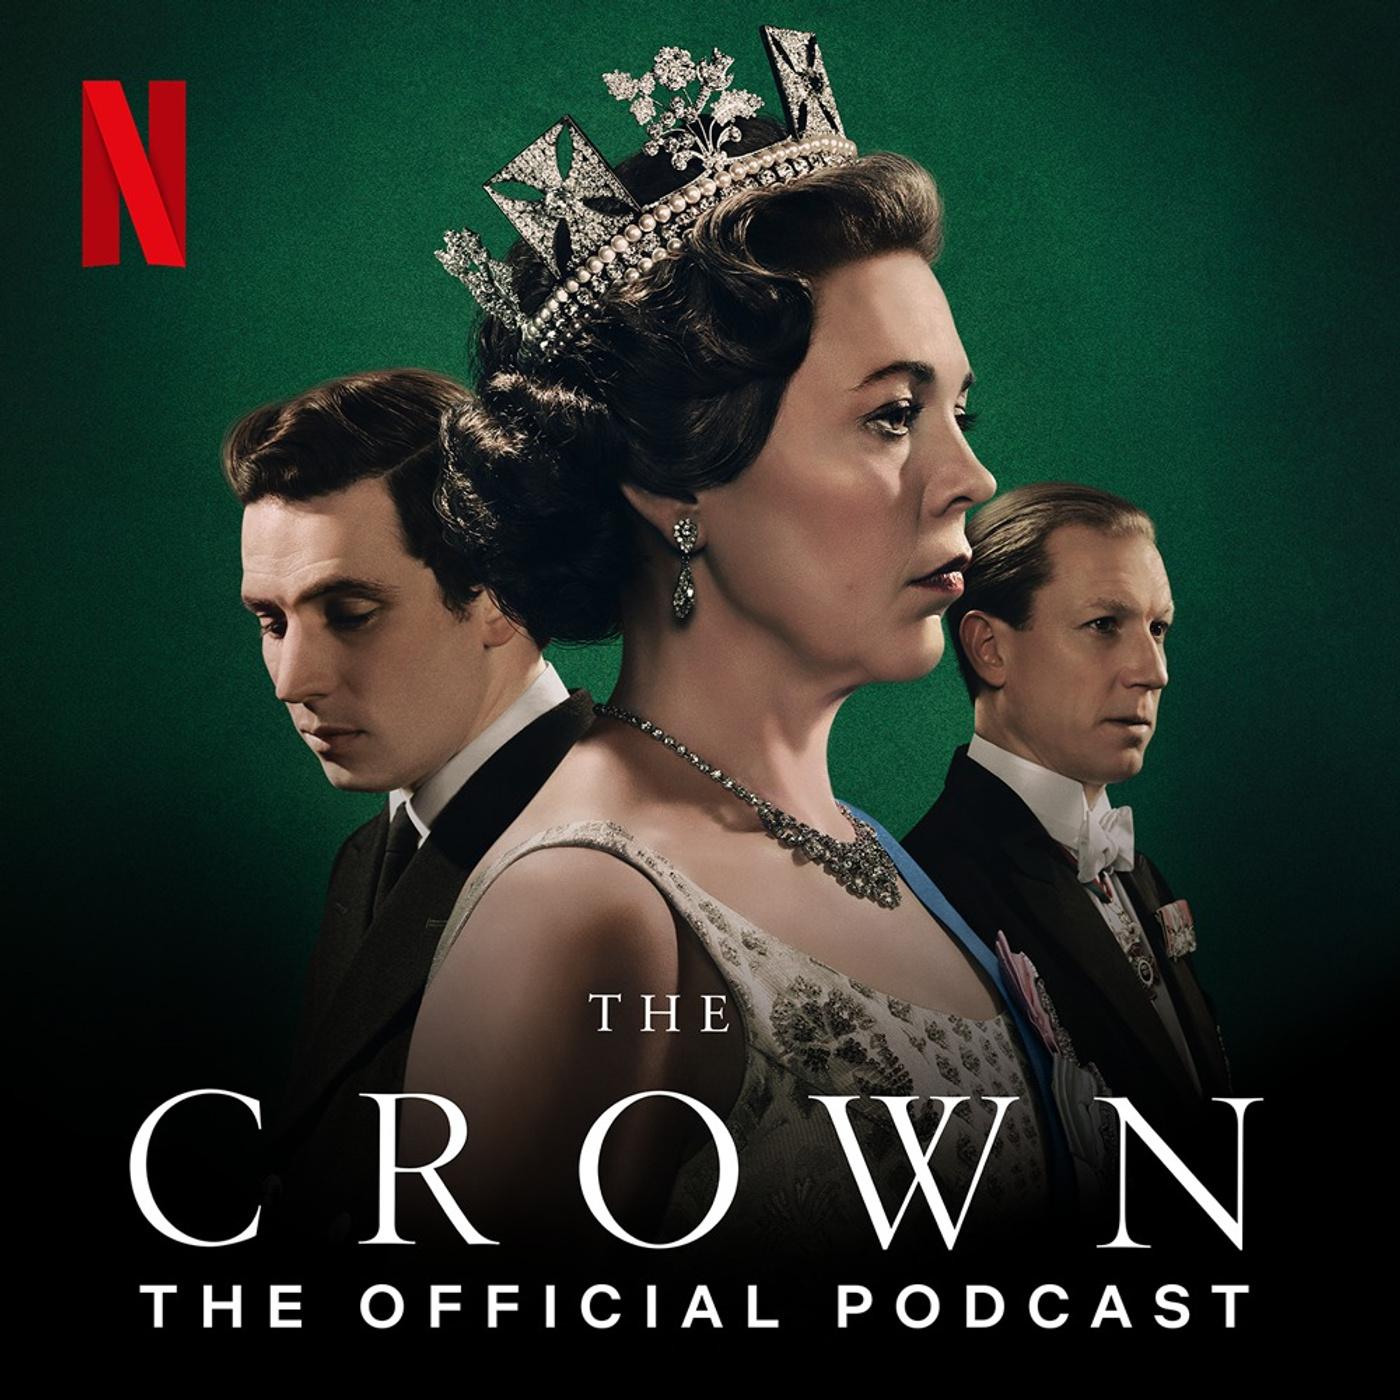 Podcast Rankings: December 4, 2019